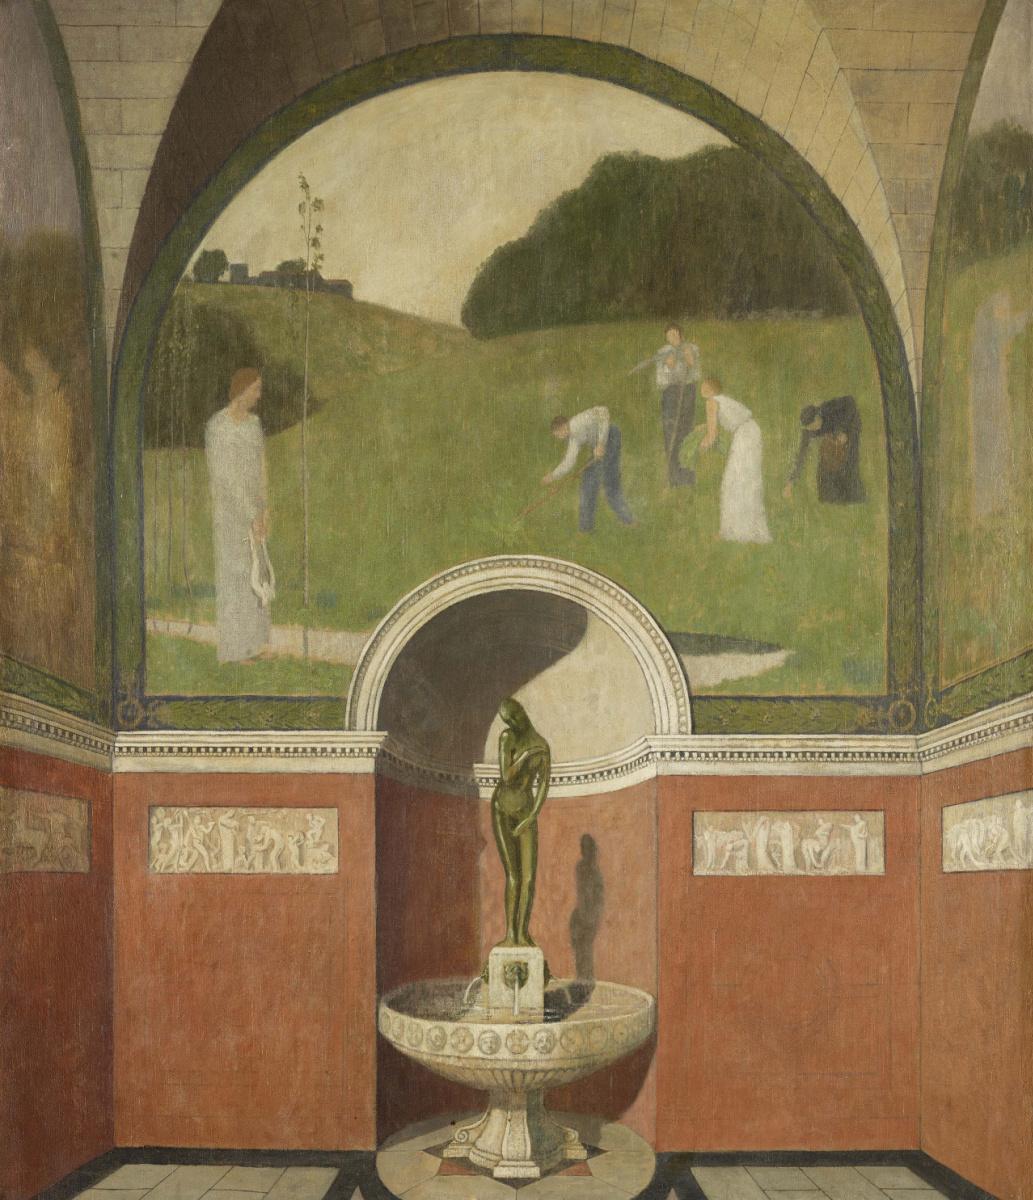 Александр Сеон. Decorative design, N/D Oil on canvas, 104.5 x 90.3 cm